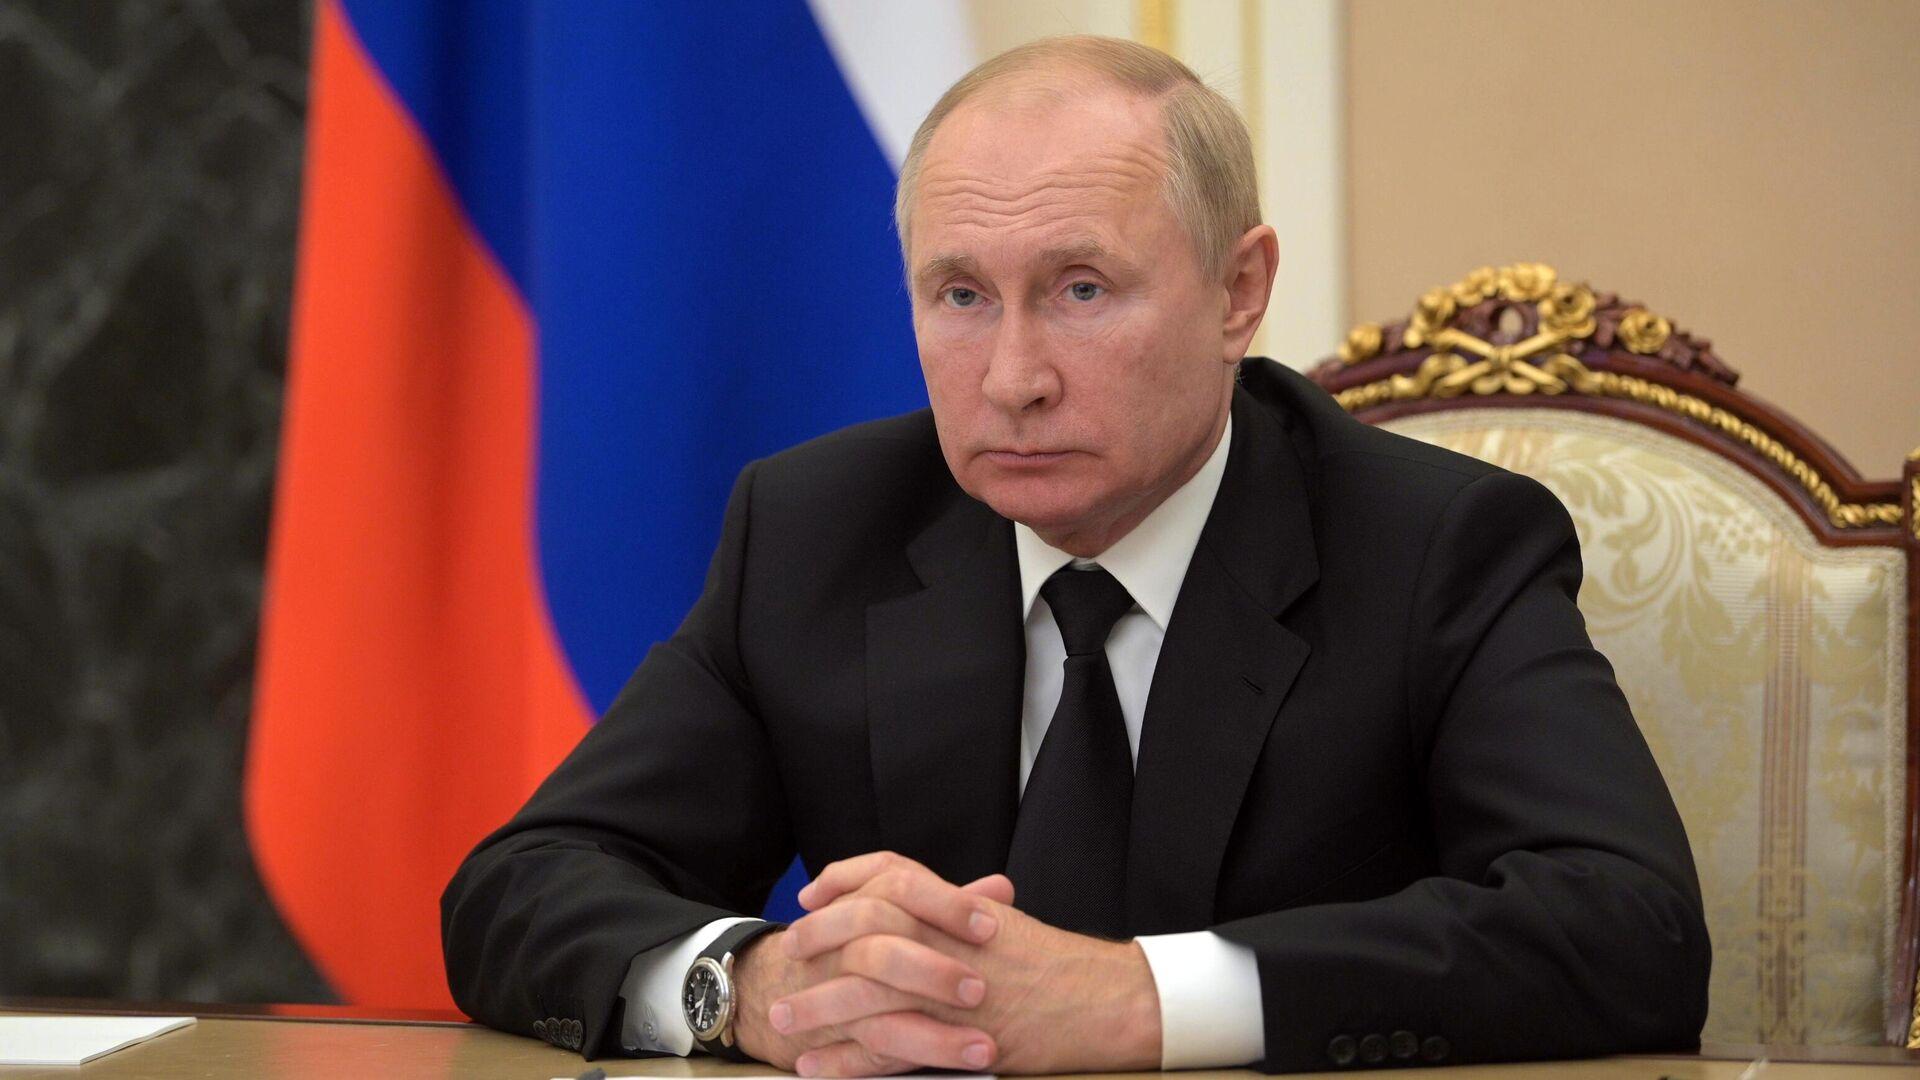 Опрос ВЦИОМ: Путину доверяют 64,6 процента россиян